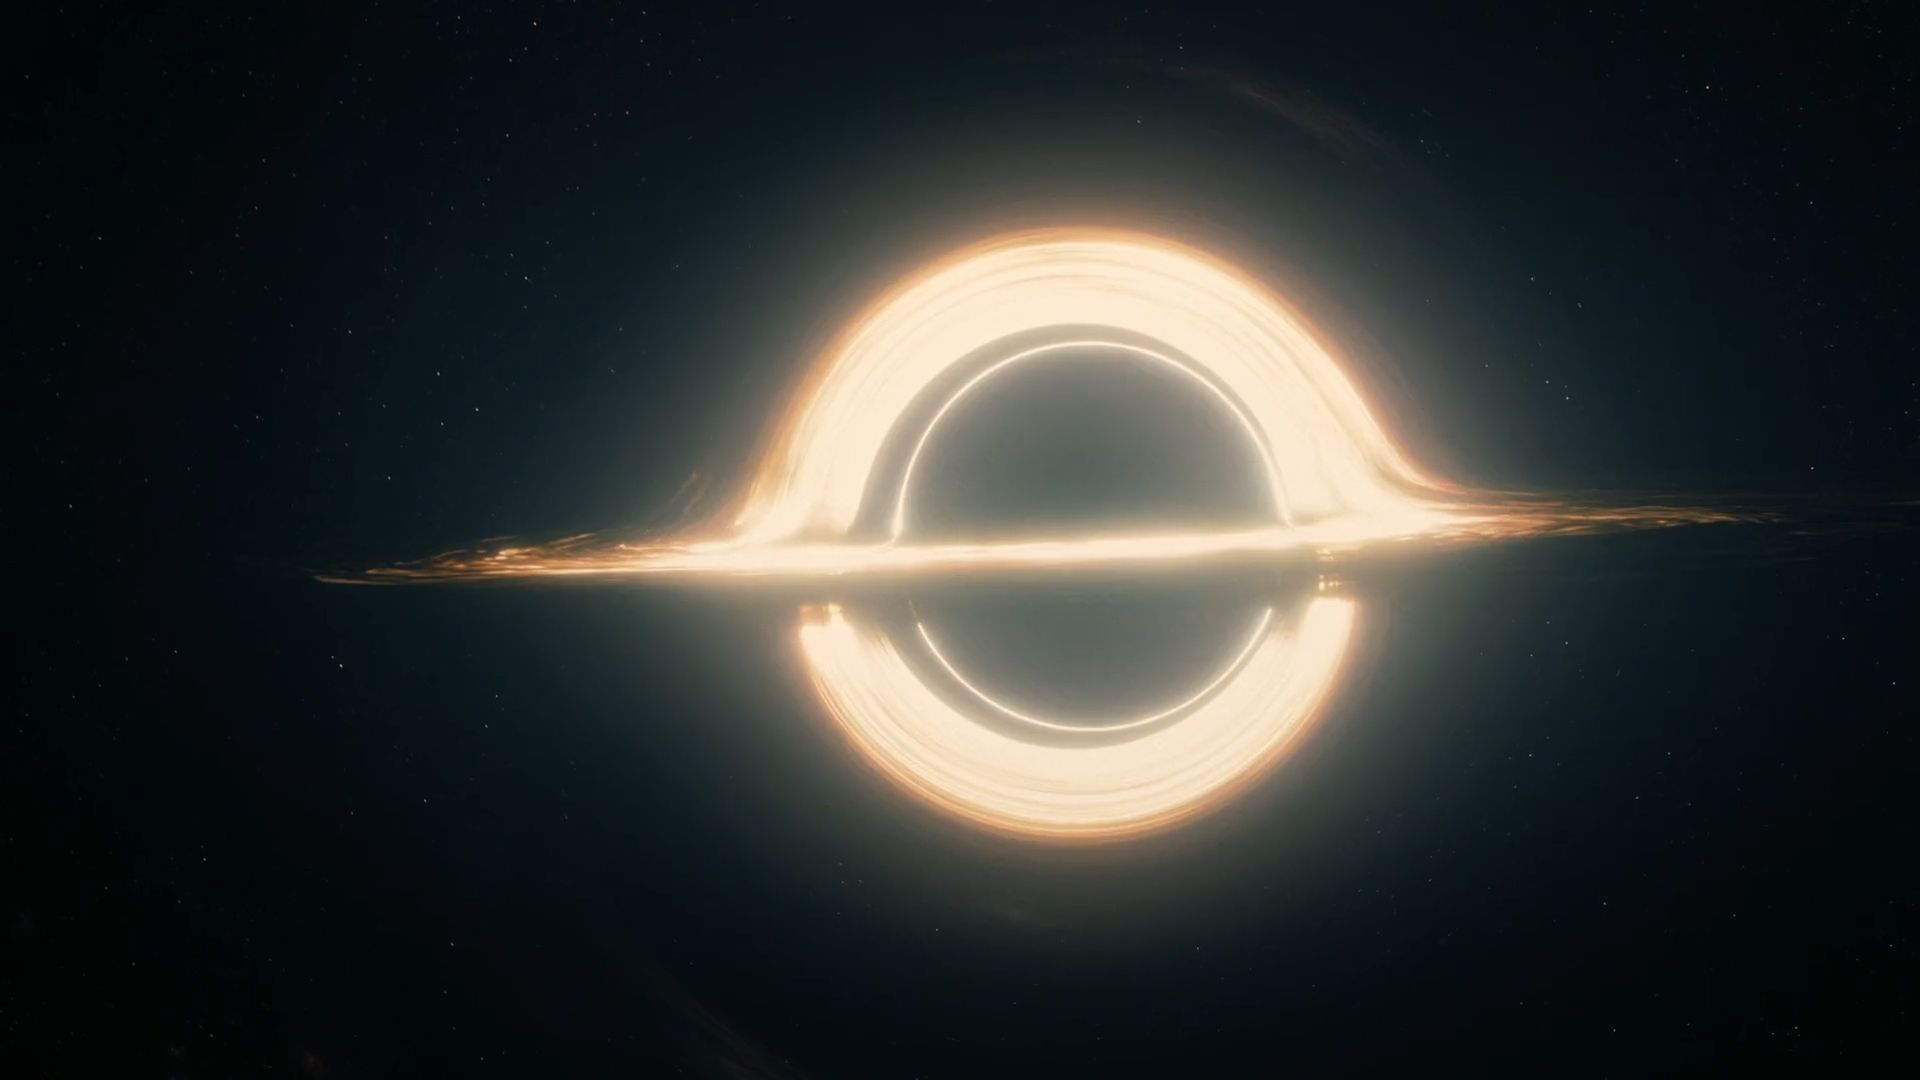 Black Hole, Background Wallpaper HD